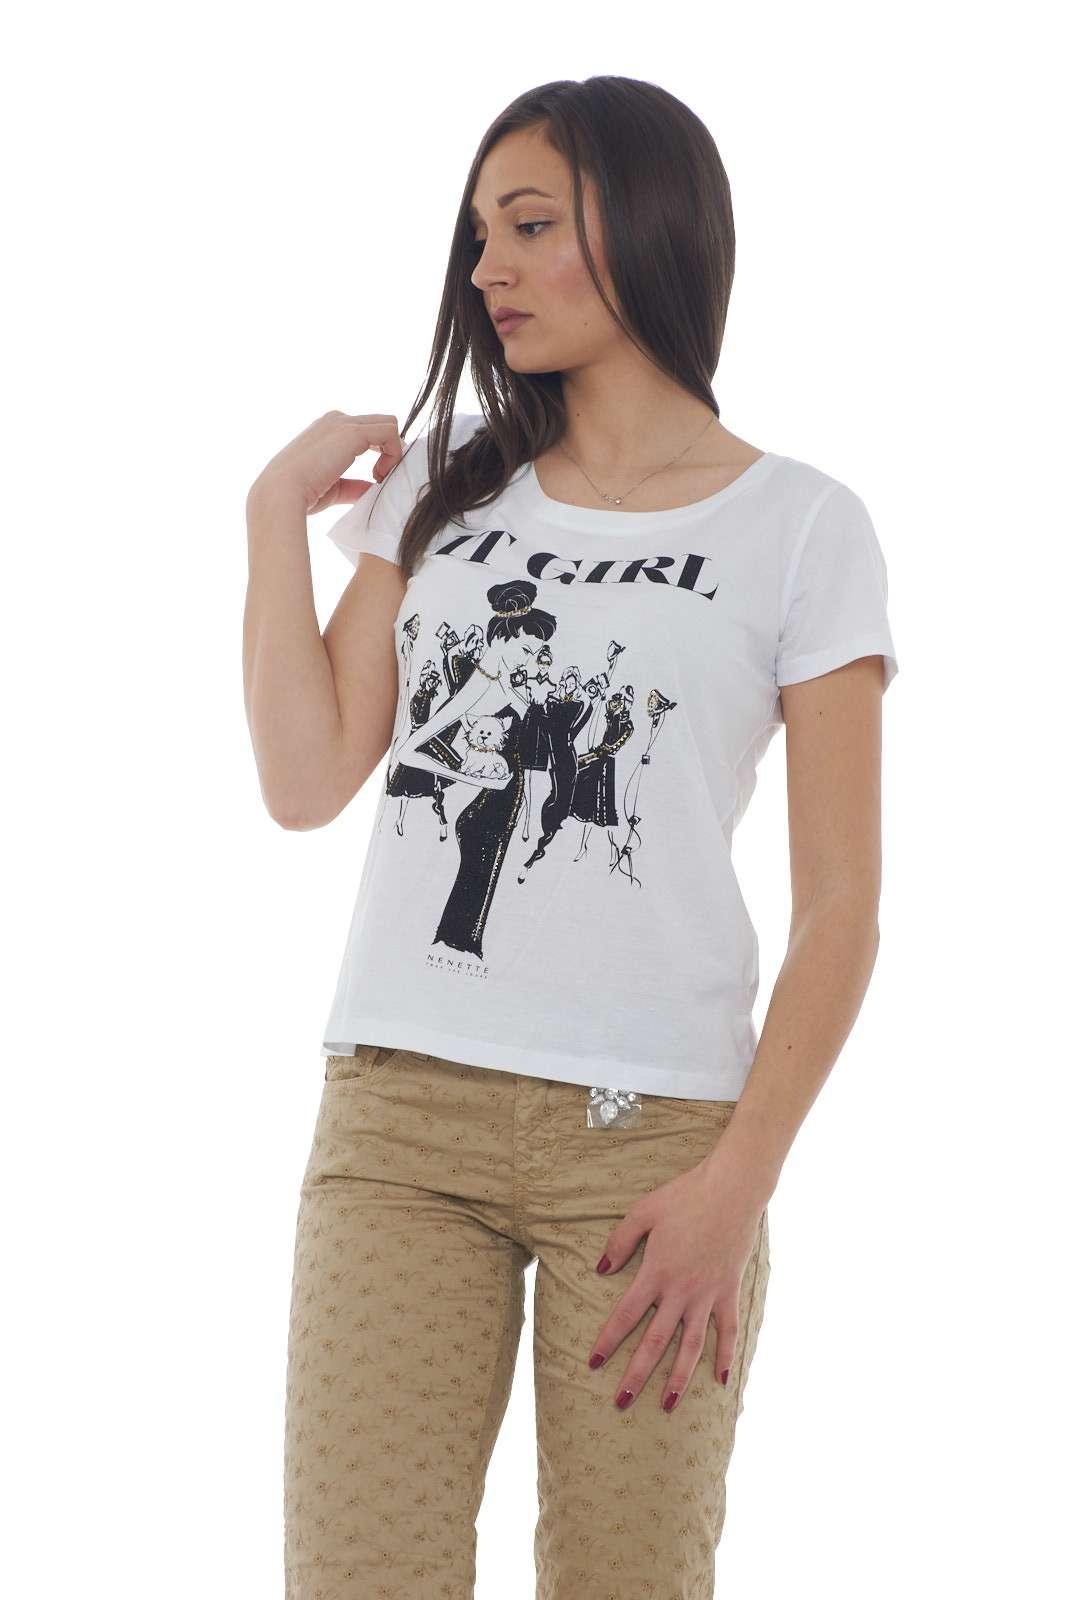 https://www.parmax.com/media/catalog/product/a/i/PE-outlet_parmax-t-shirt-donna-Nenette-DAFNE-A_2.jpg